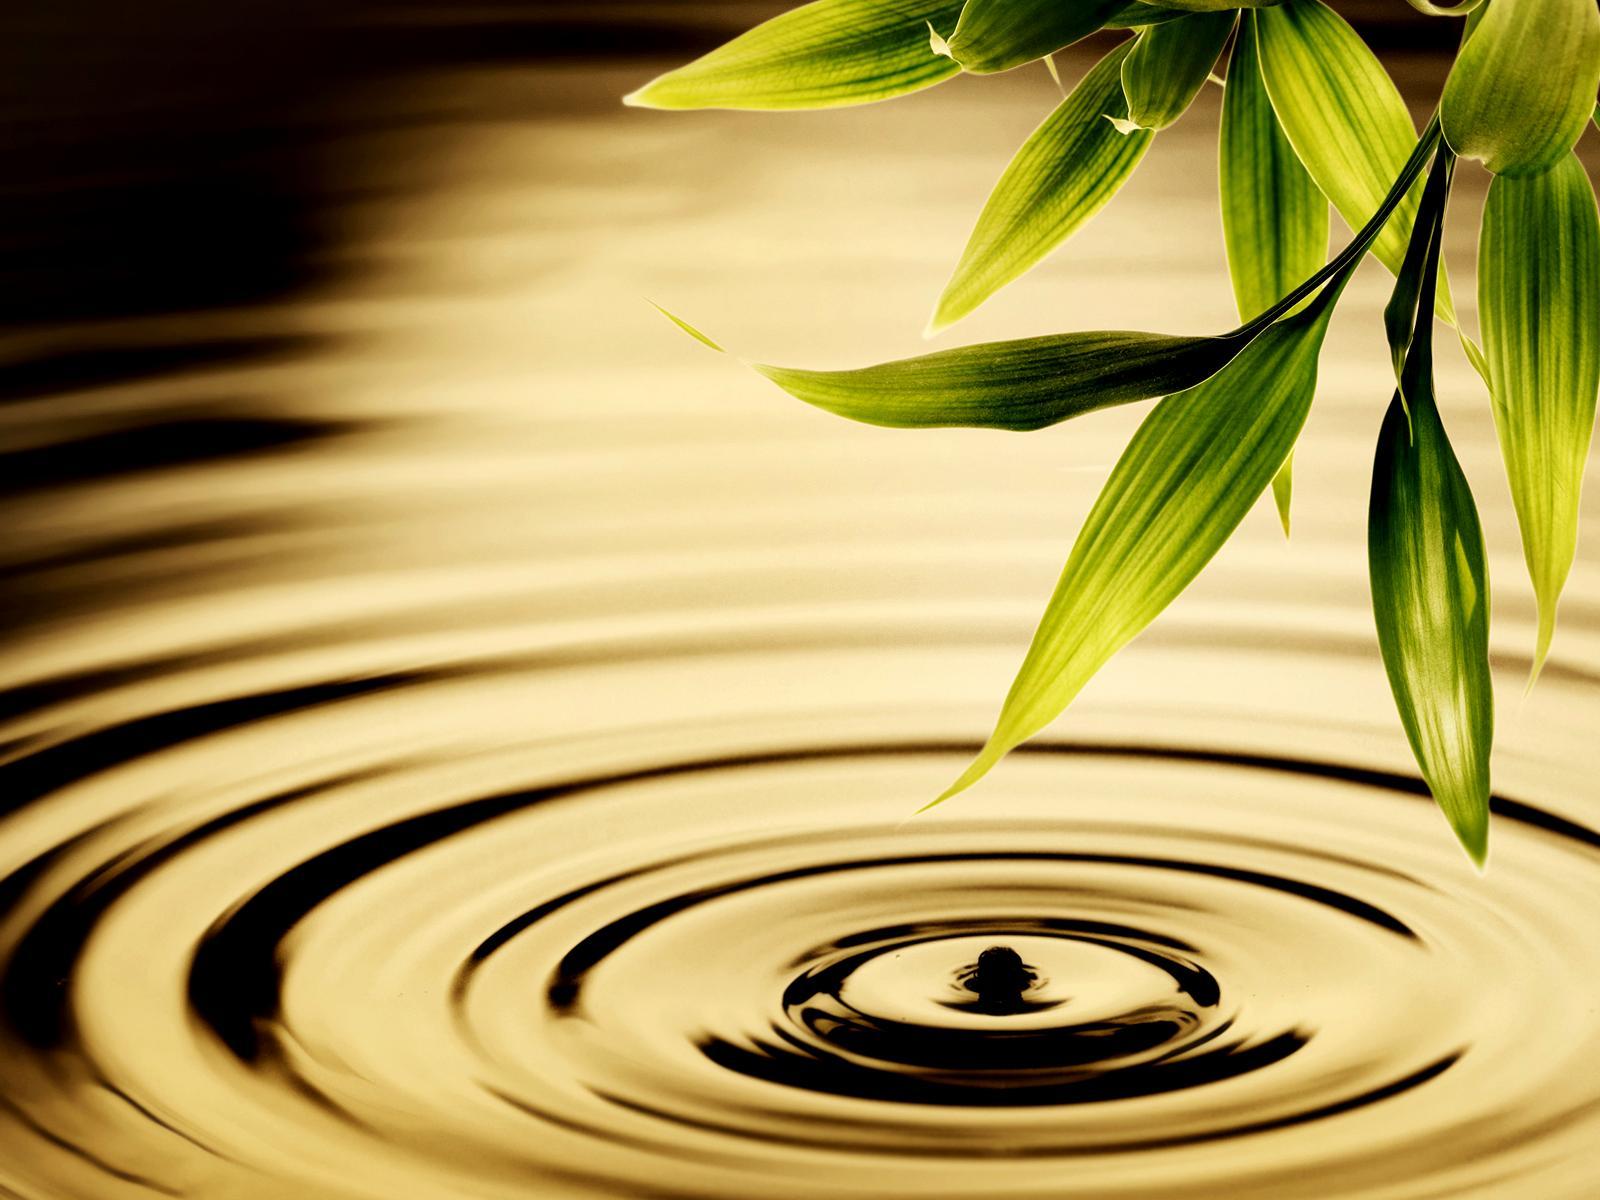 Water Ripple Wallpaper 28526